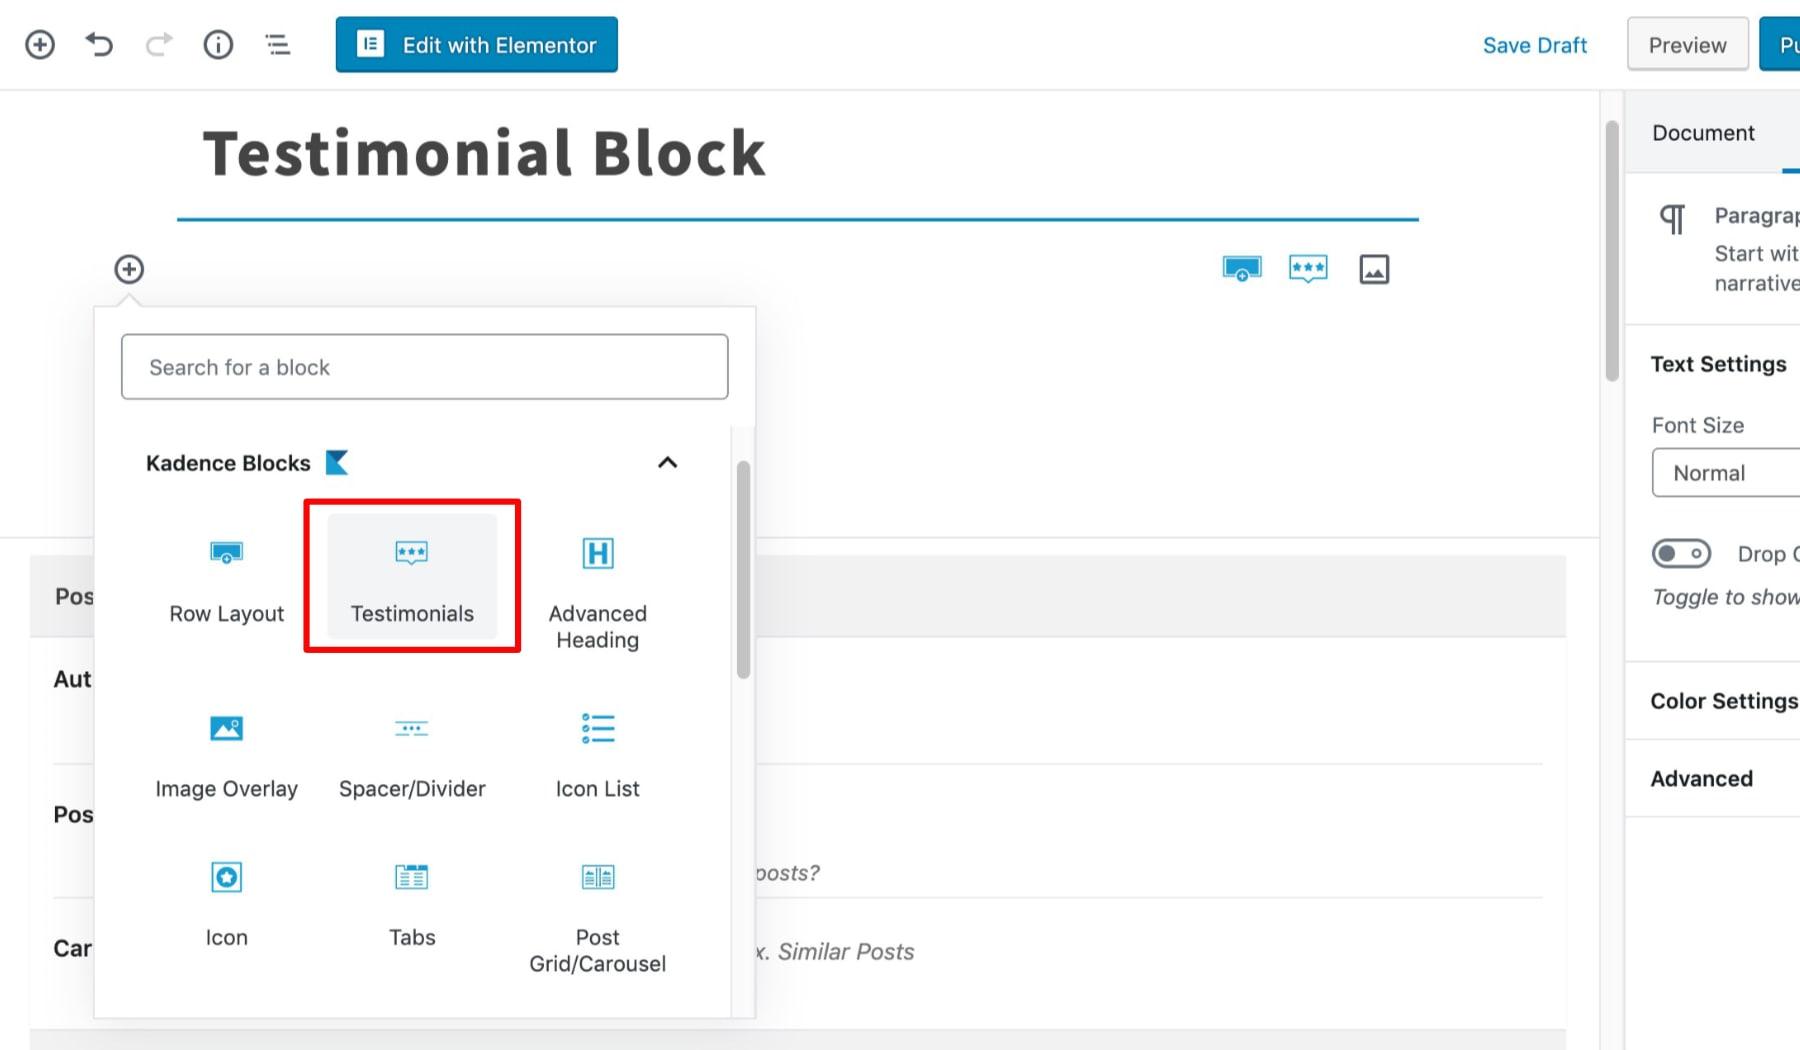 Select Testimonial Block